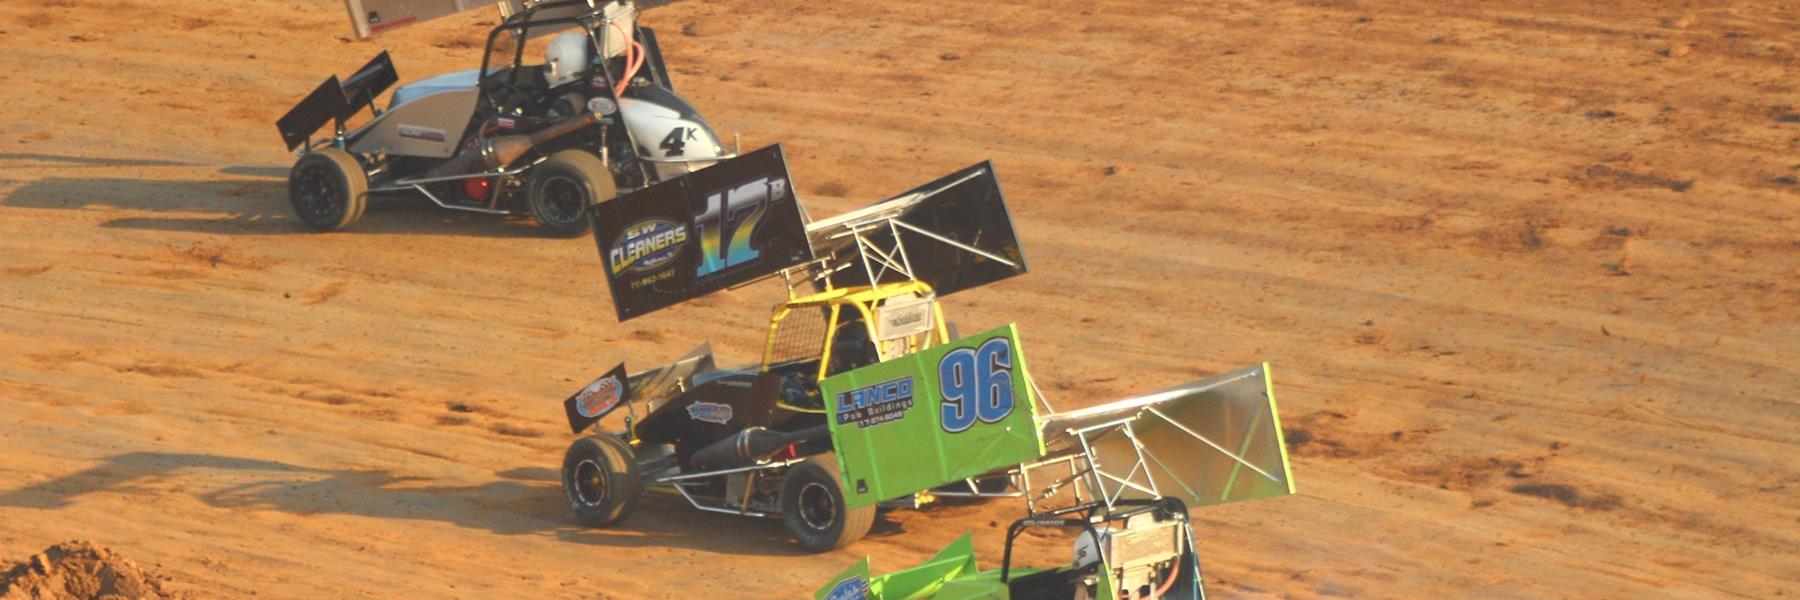 Mason Dixon 270 Racing Series